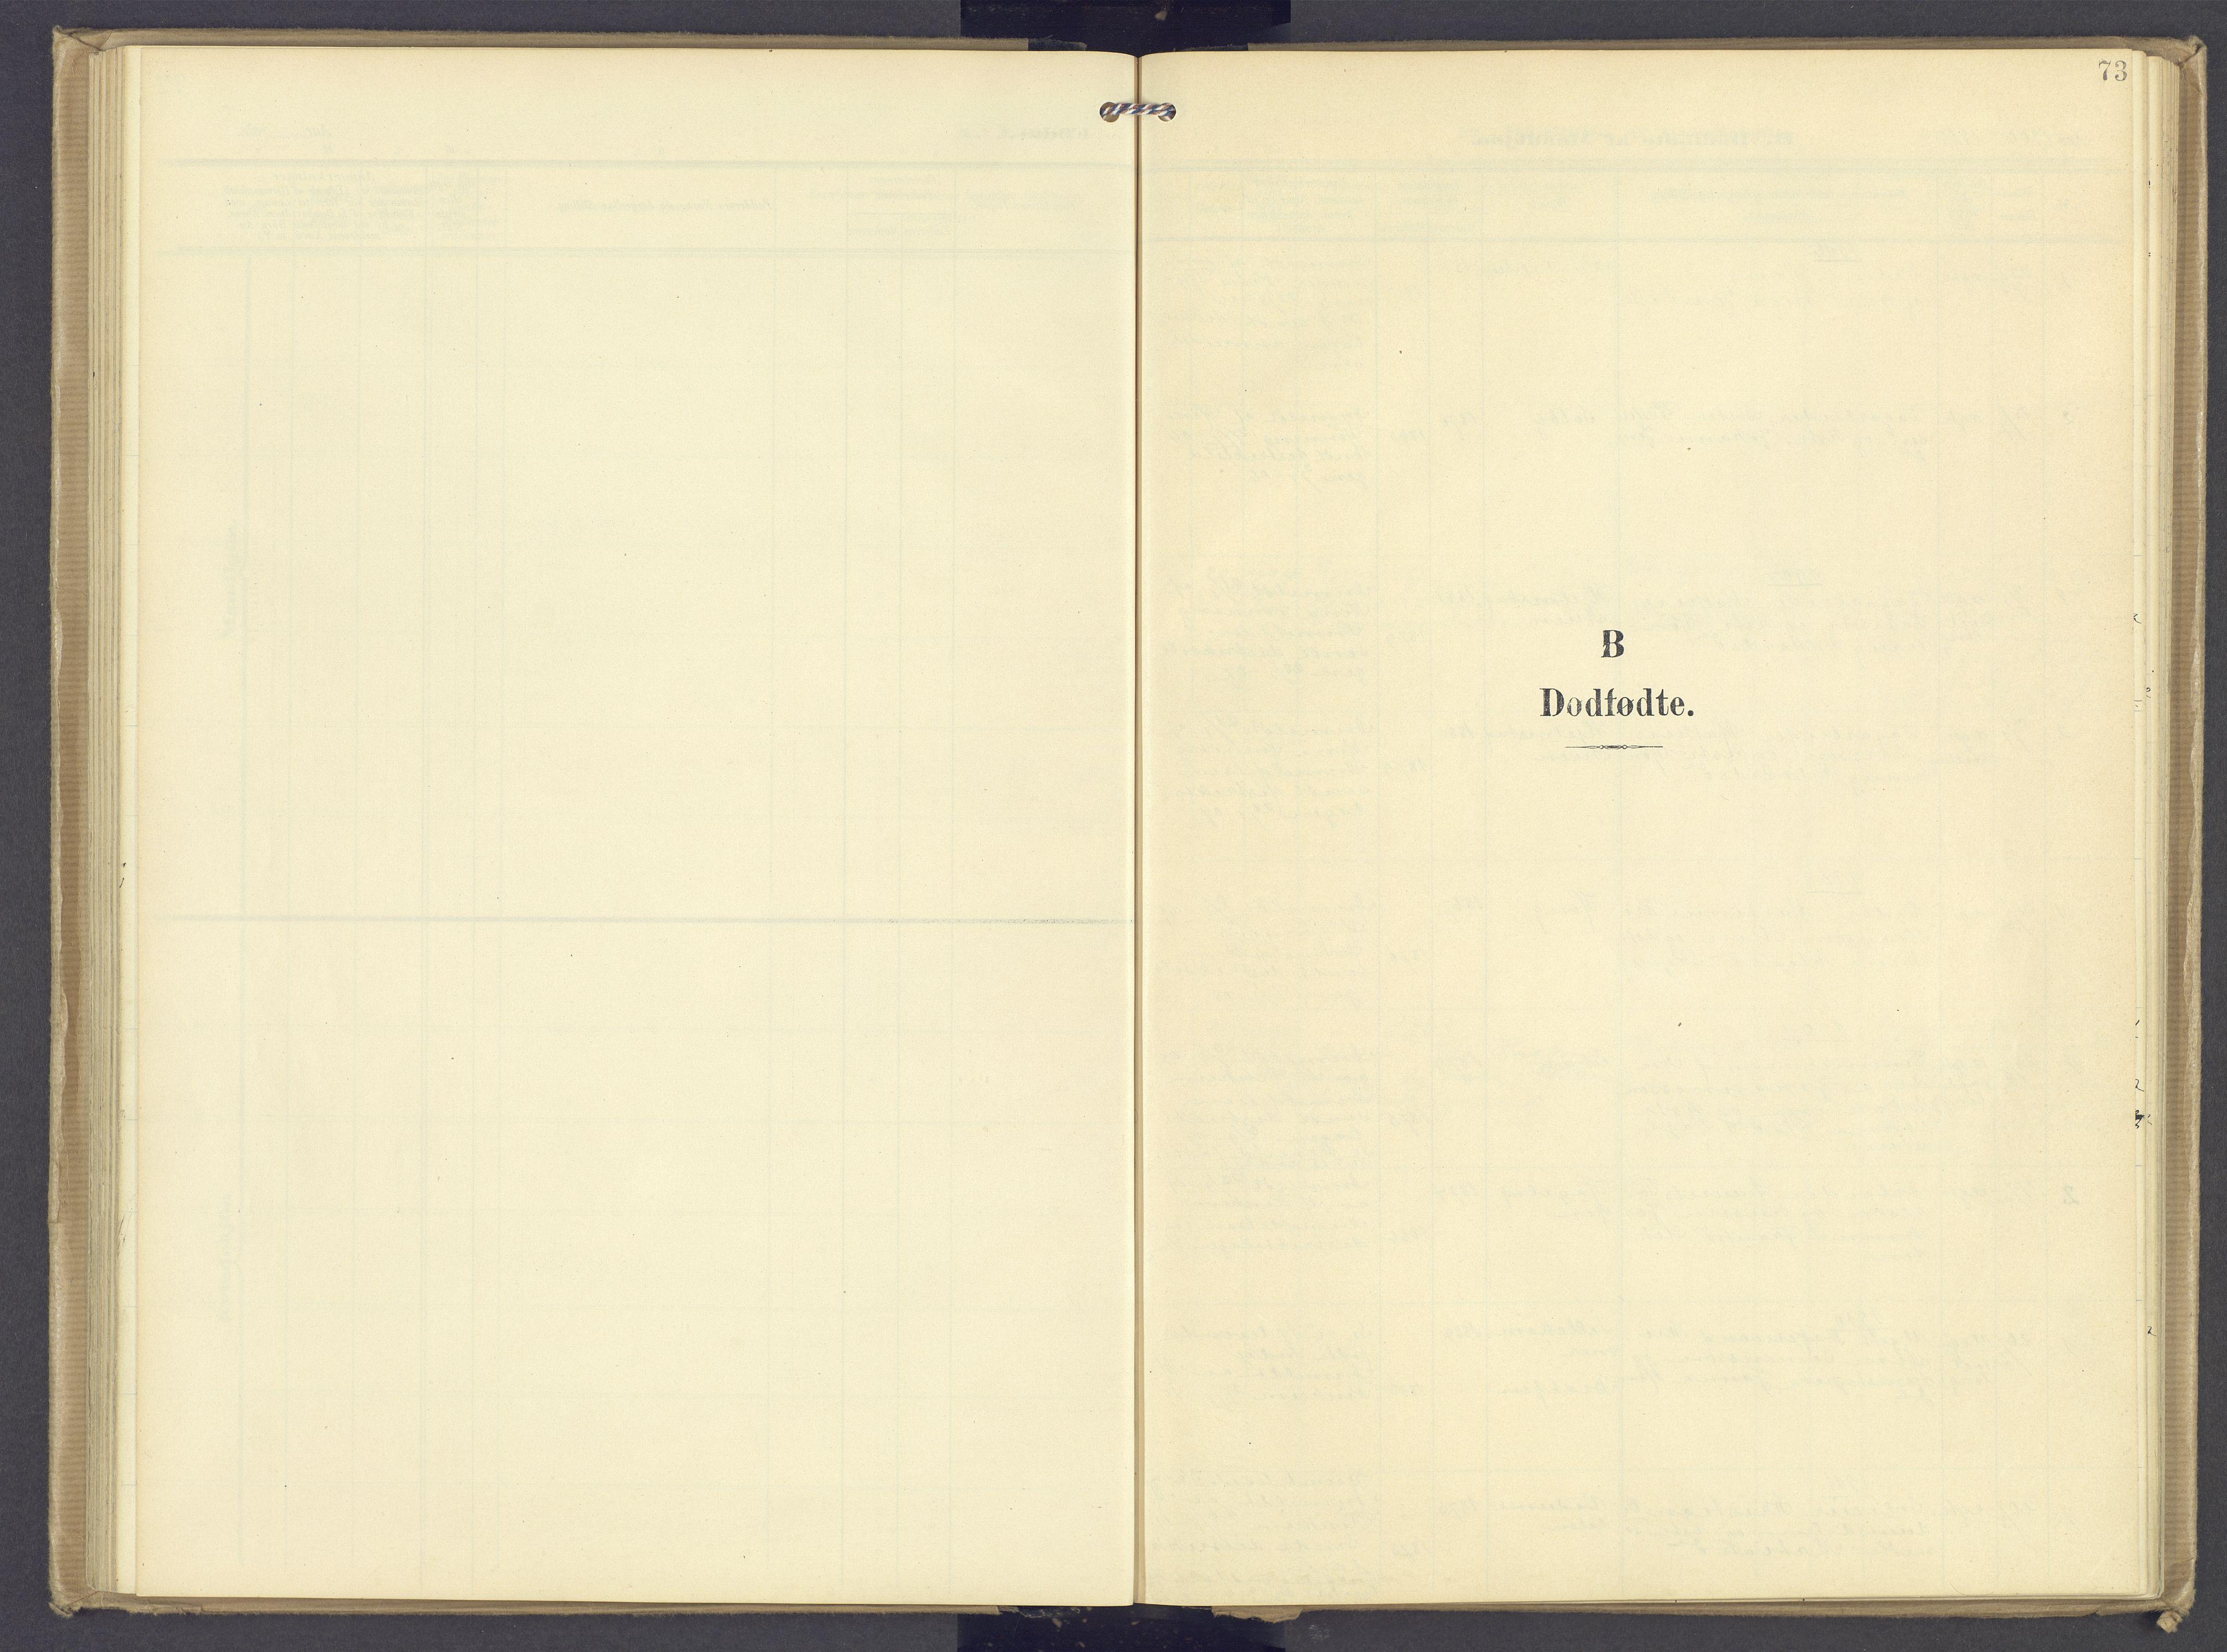 SAH, Øyer prestekontor, Ministerialbok nr. 13, 1905-1920, s. 73